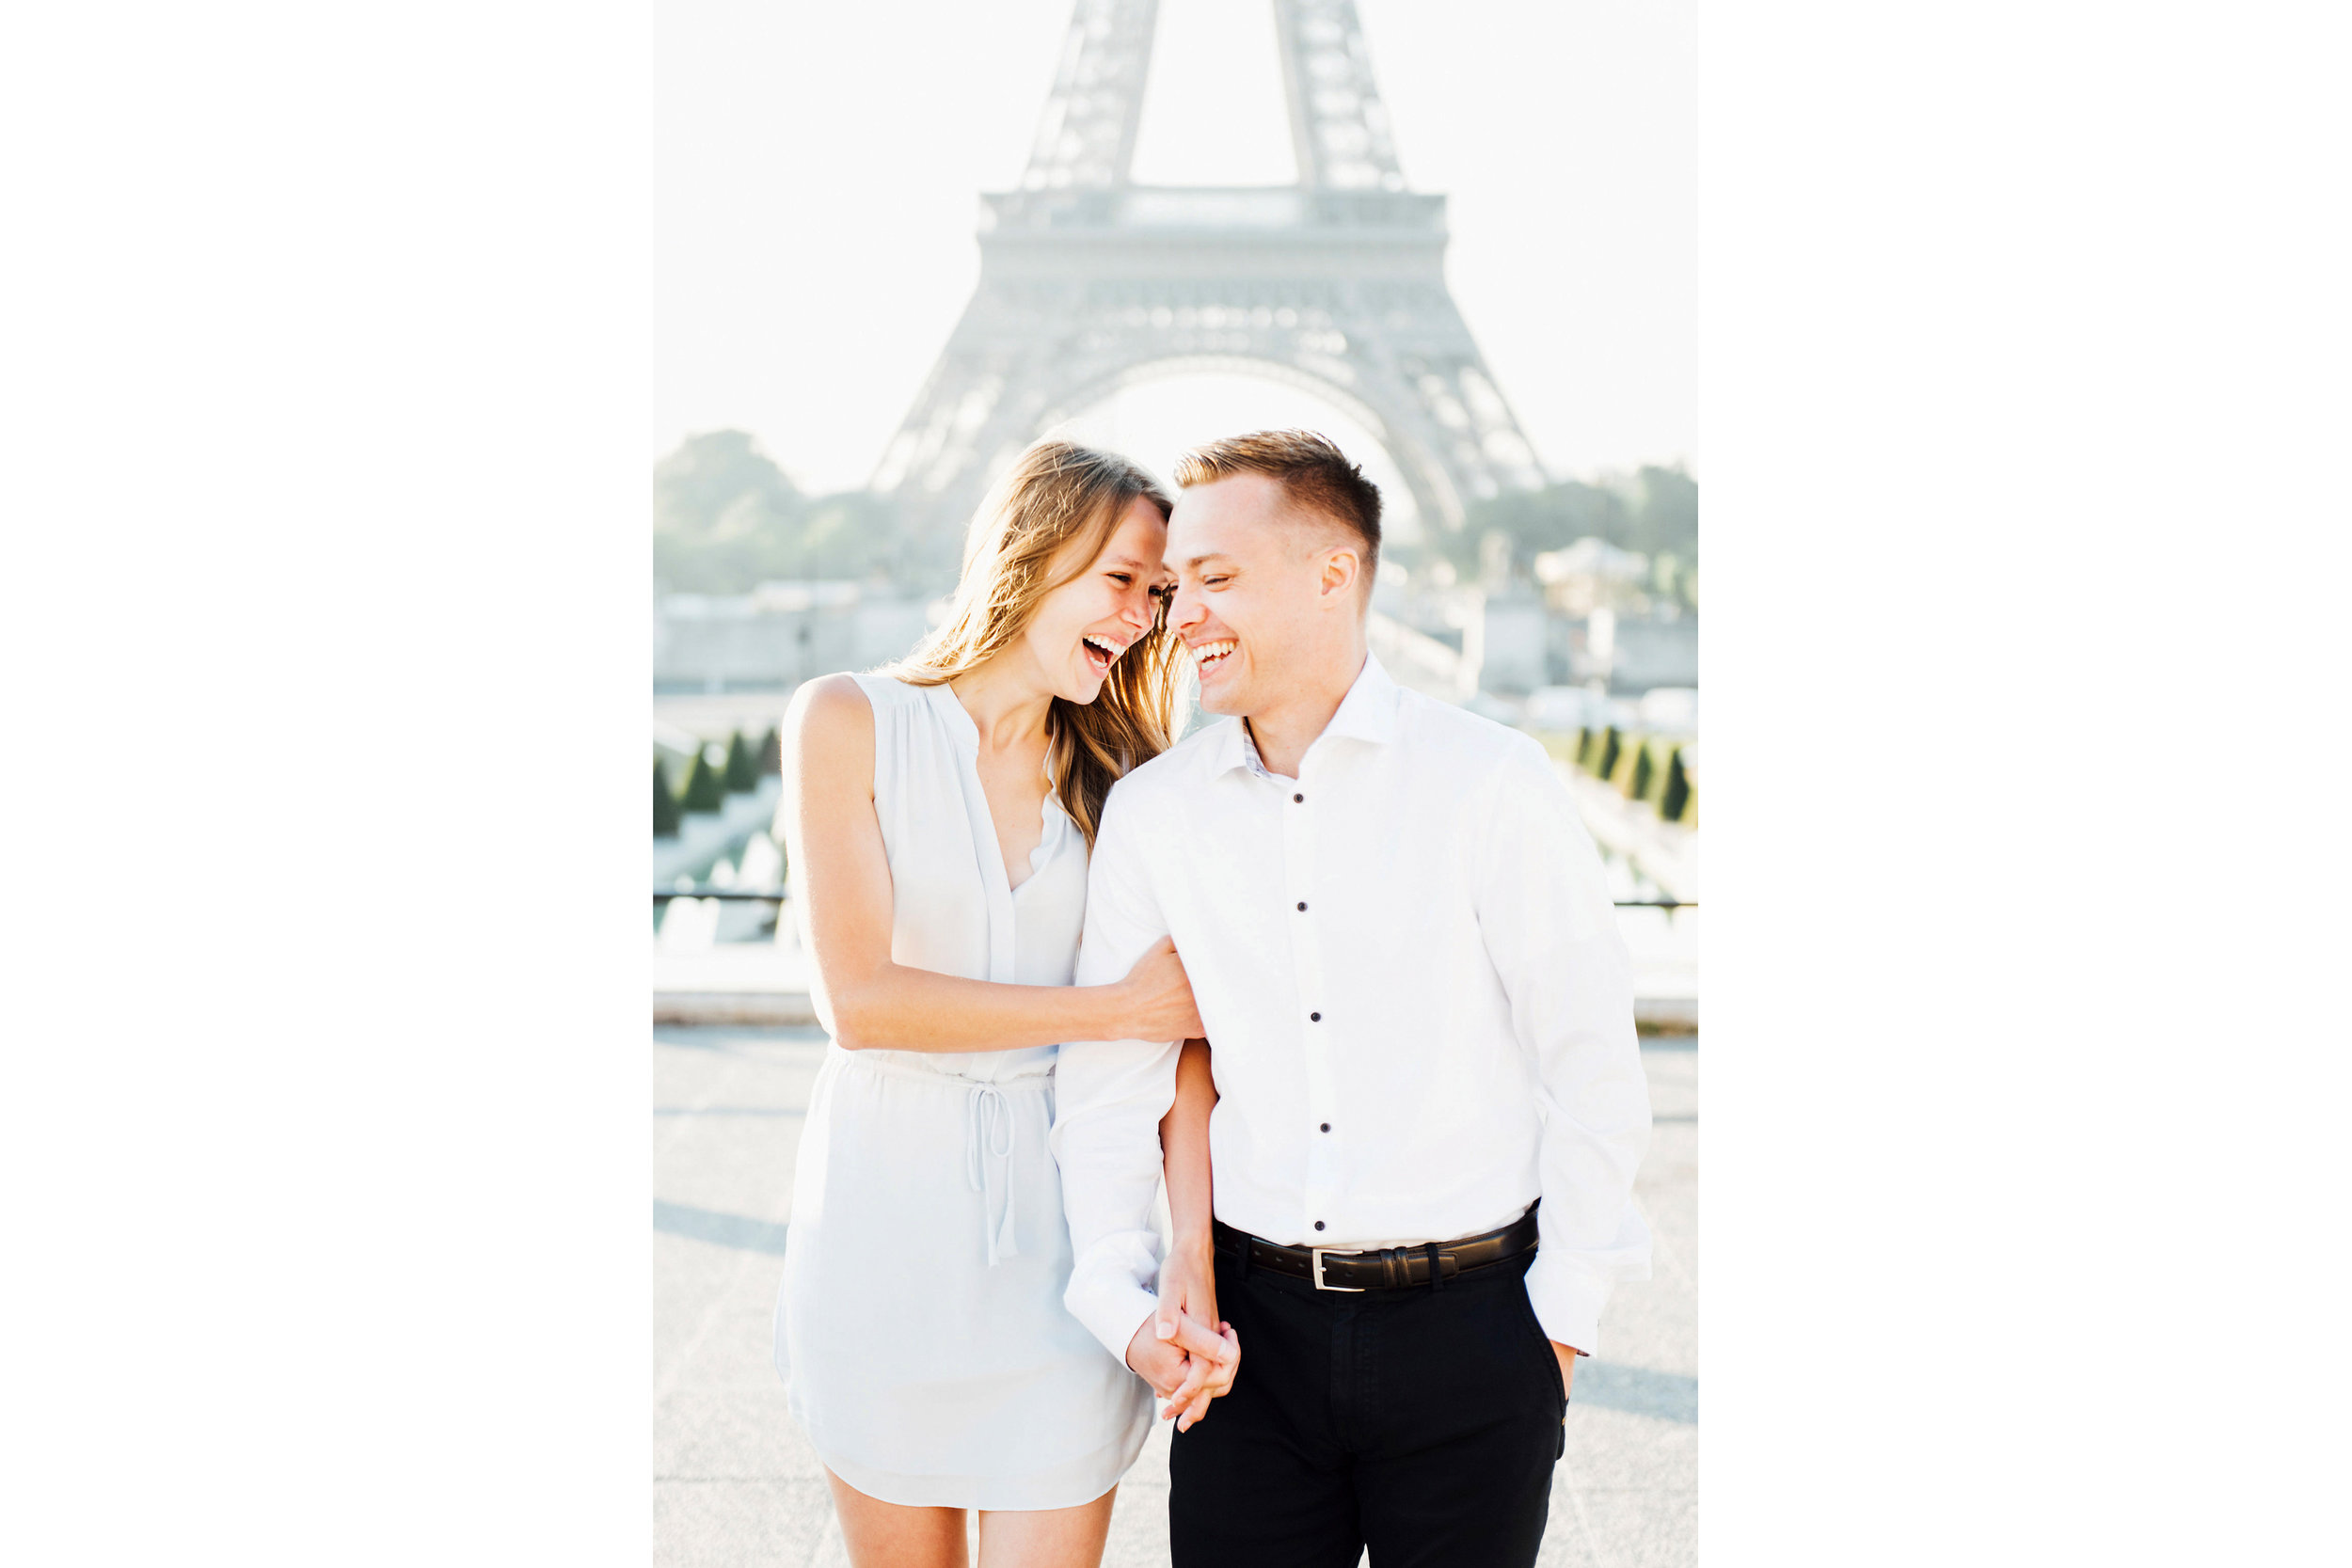 Katie_Mitchell_Paris_France_Engagement_Photographer_21.jpg